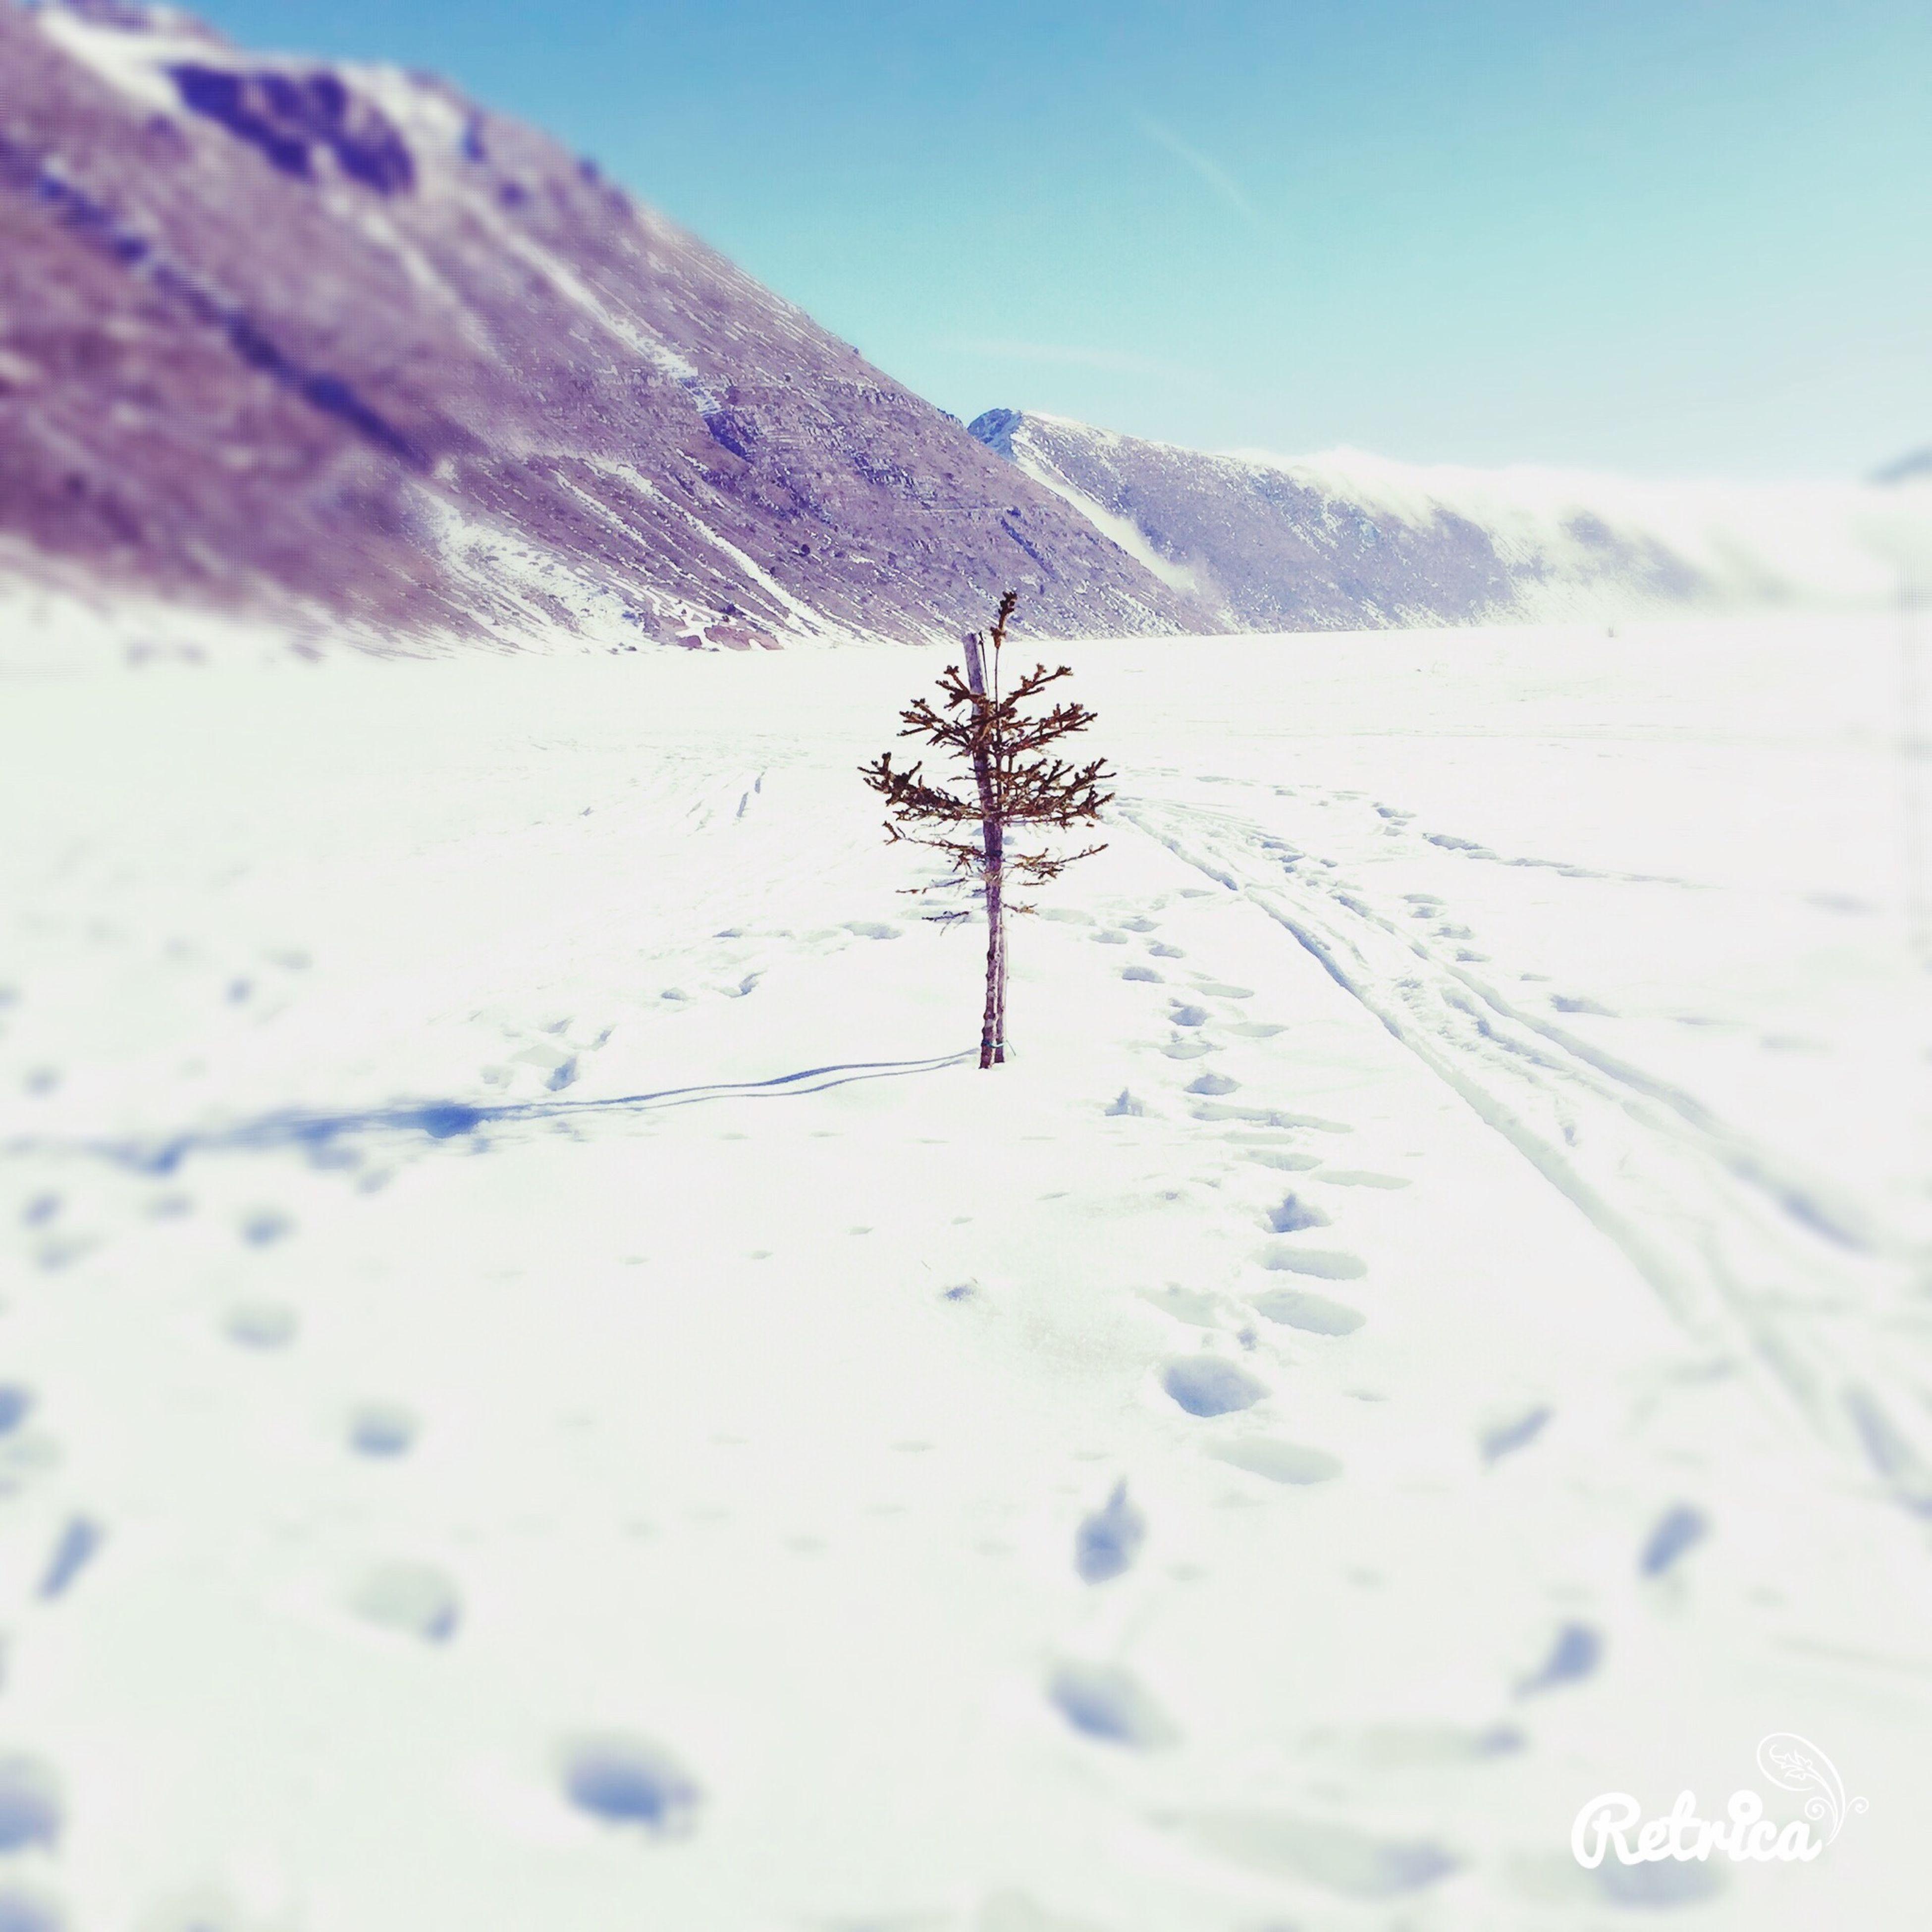 snow, winter, cold temperature, season, weather, mountain, covering, frozen, landscape, nature, tranquility, tranquil scene, snowcapped, white color, snowcapped mountain, covered, beauty in nature, snow covered, clear sky, non-urban scene